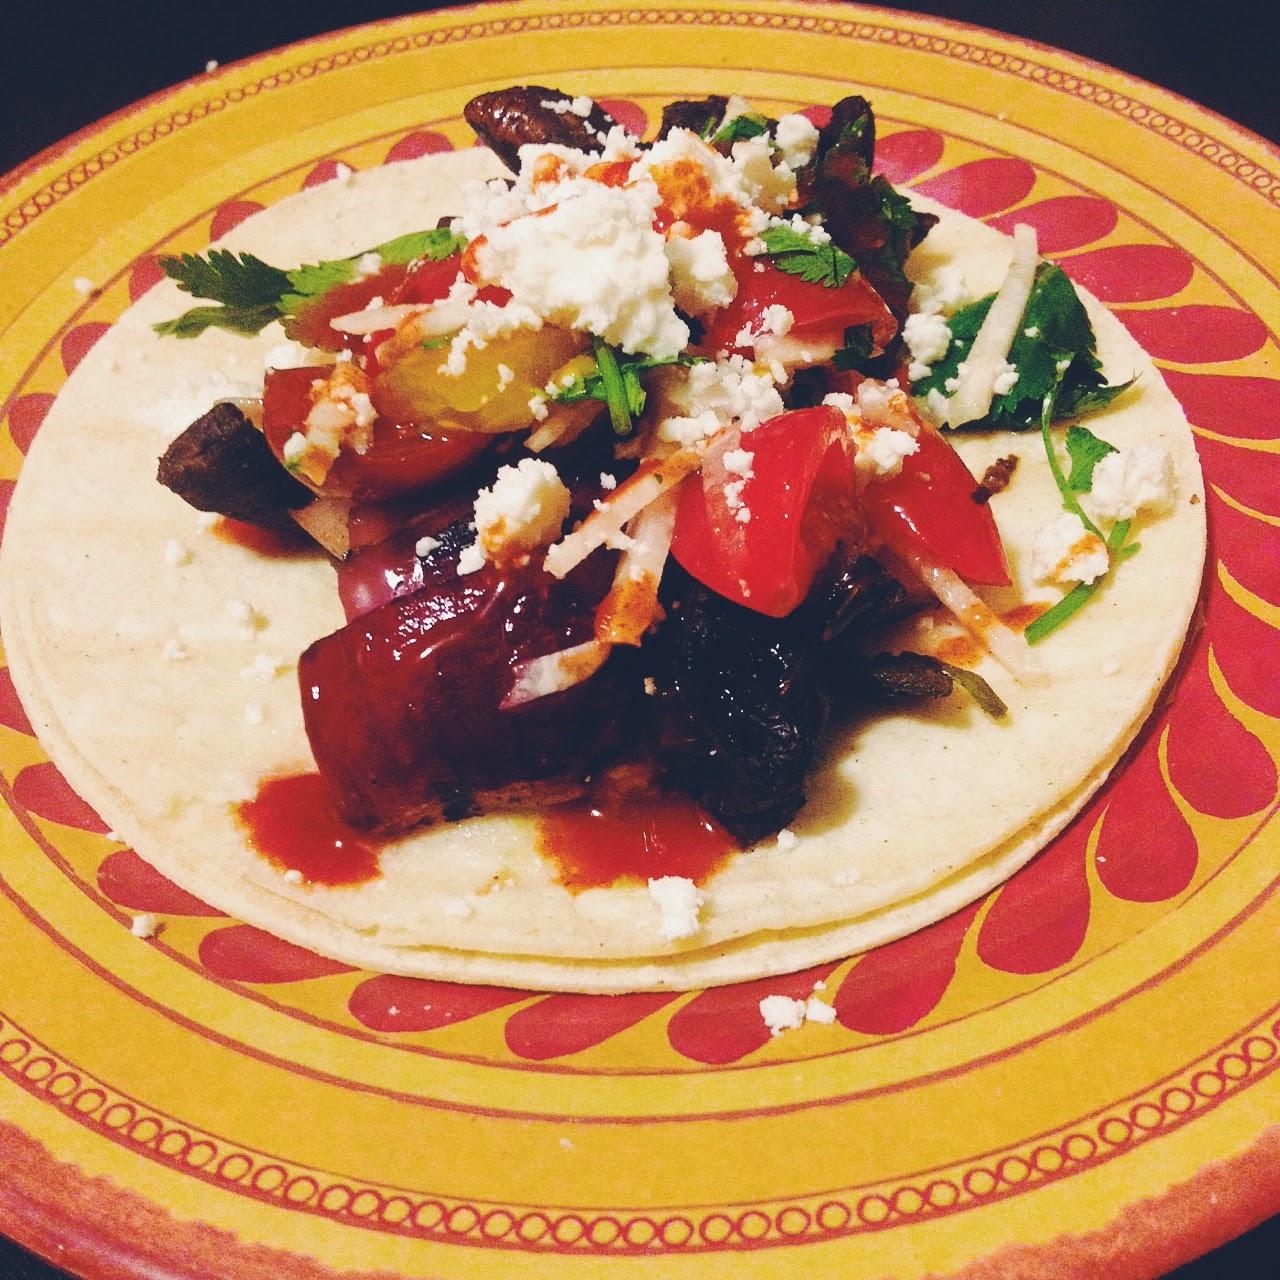 Grilled Mushroom & Poblano Tacos | hardparade.blogspot.com